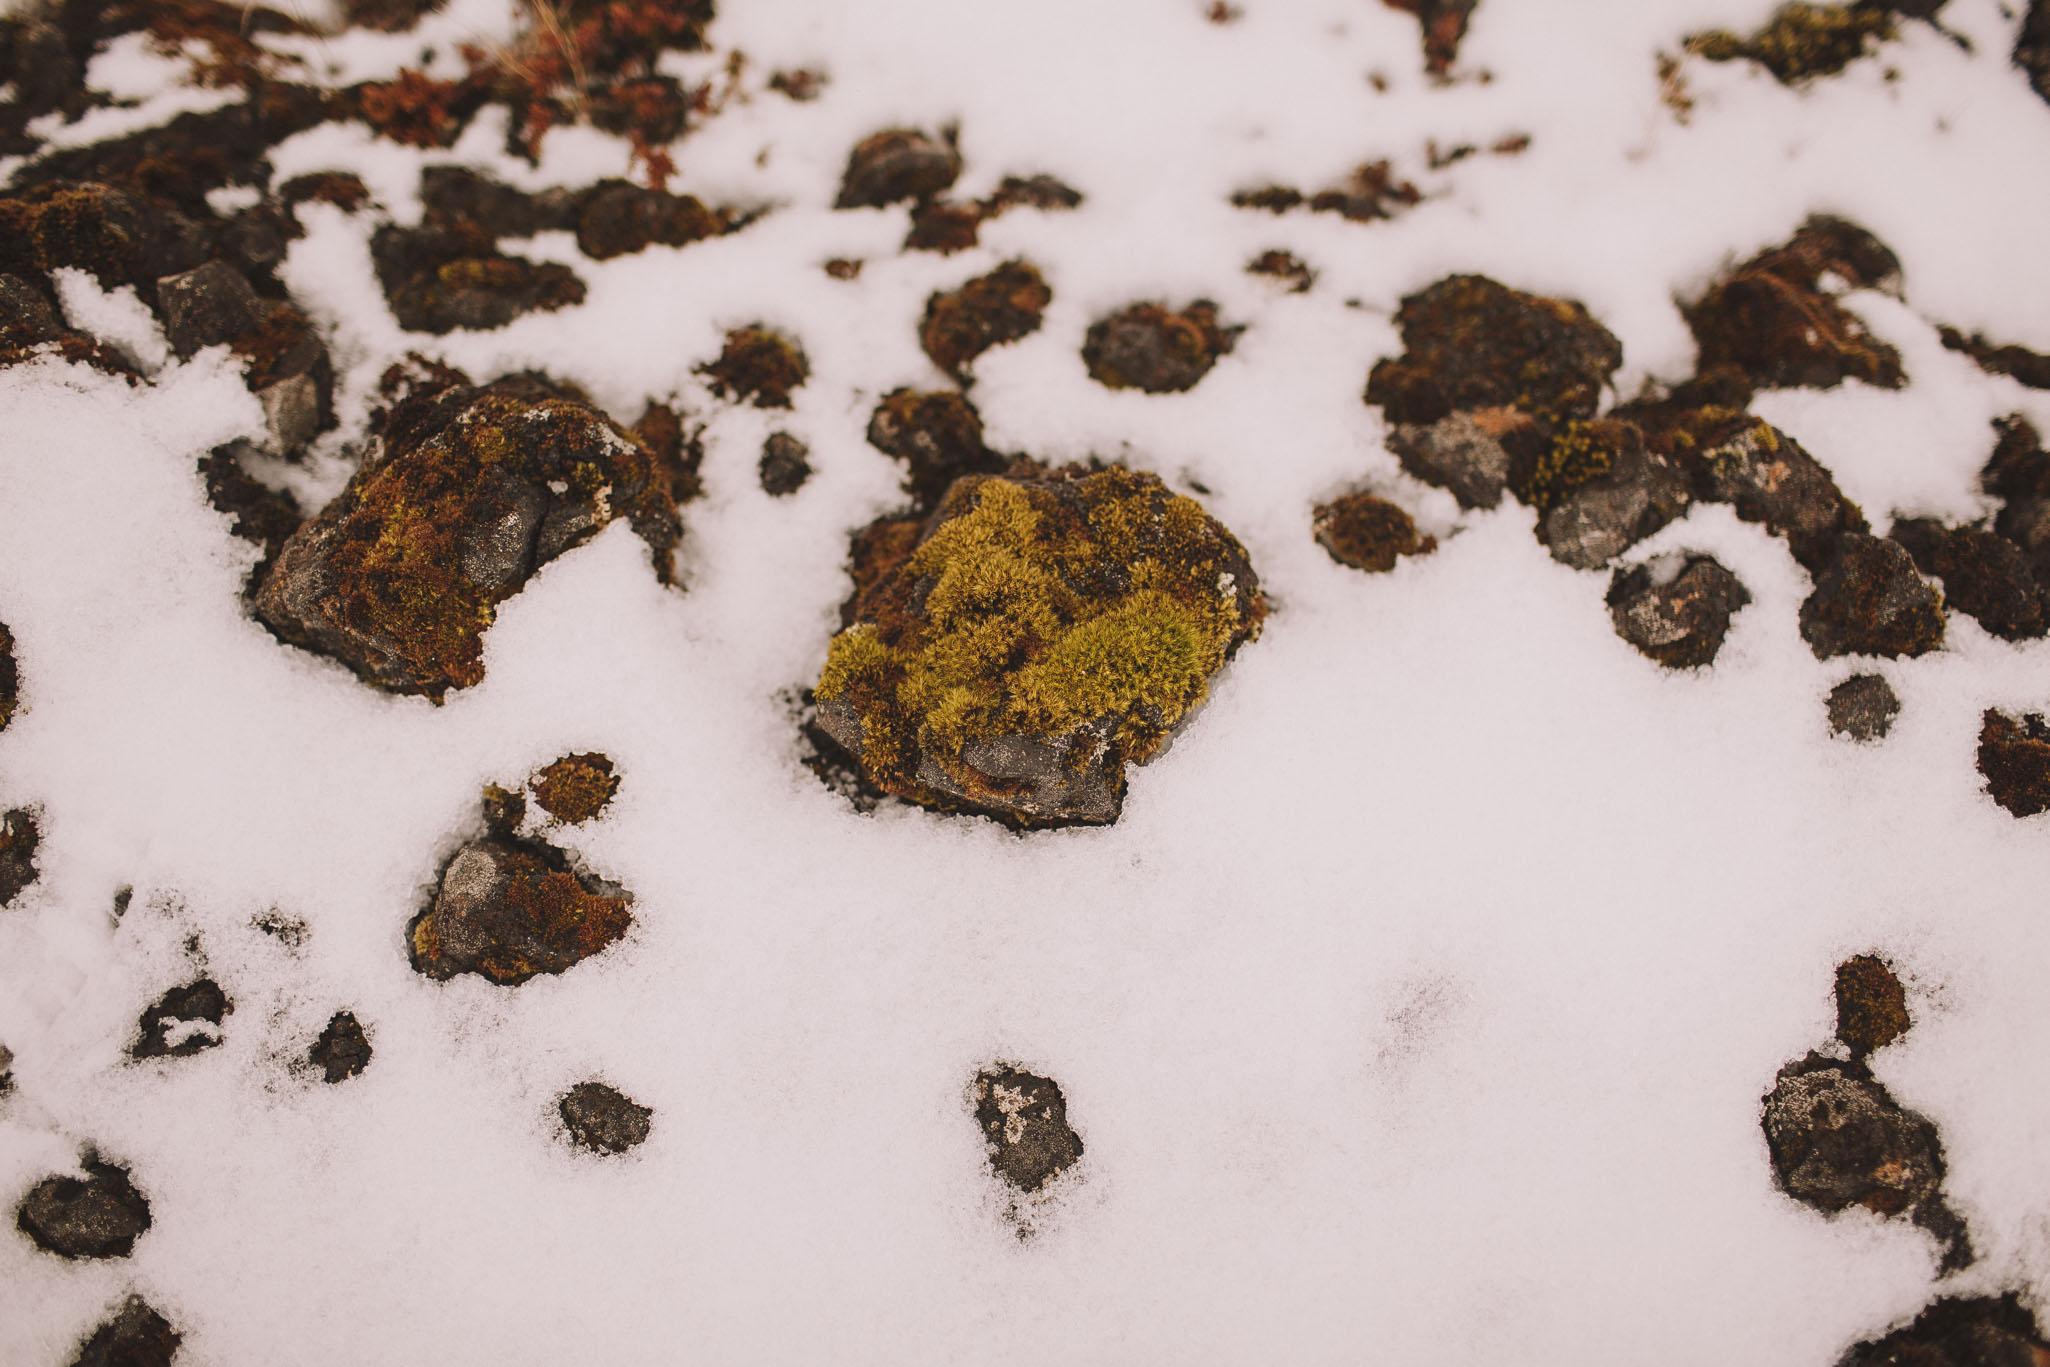 Road-trip-Islande-Iceland-Voyage-Travel-Portrait-Jérémy-Boyer-Geysir-Geysers-Horse-snow-ice-Gullfoss-11.jpg